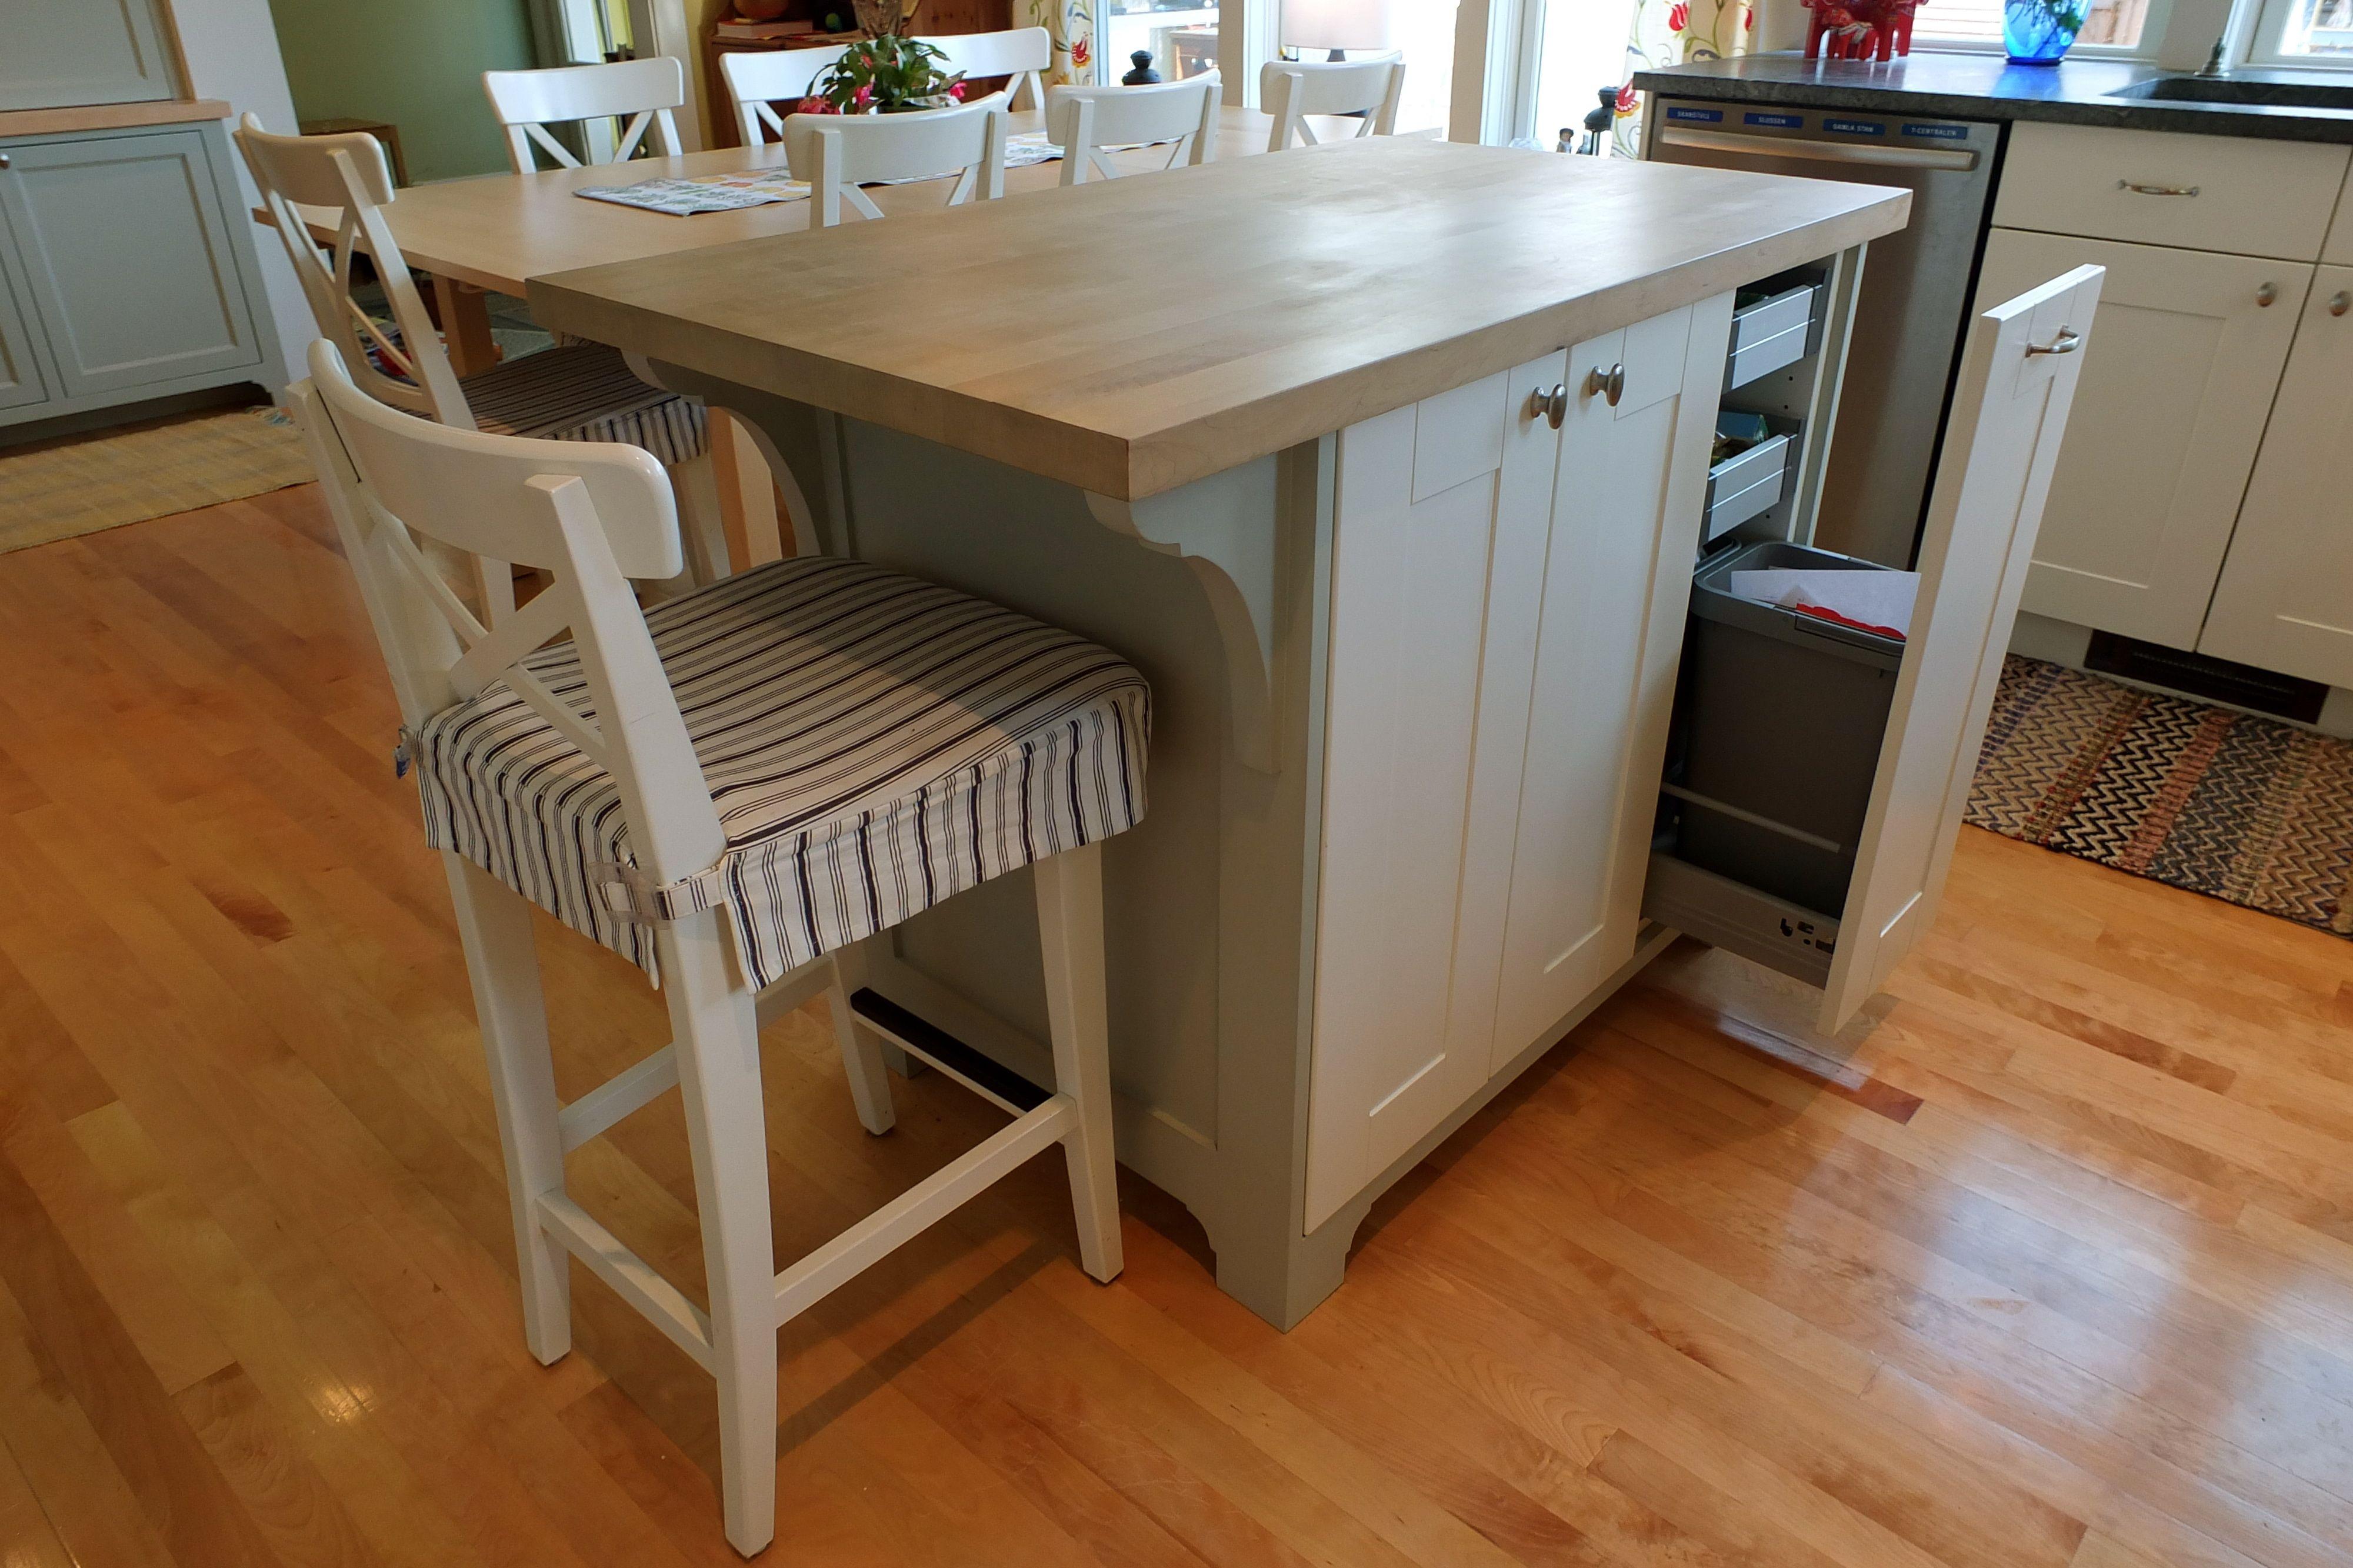 Custom Built Island Using Ikea Cabinet Doors And Hardware Diy Kitchen Island Diy Kitchen Kitchen Addition